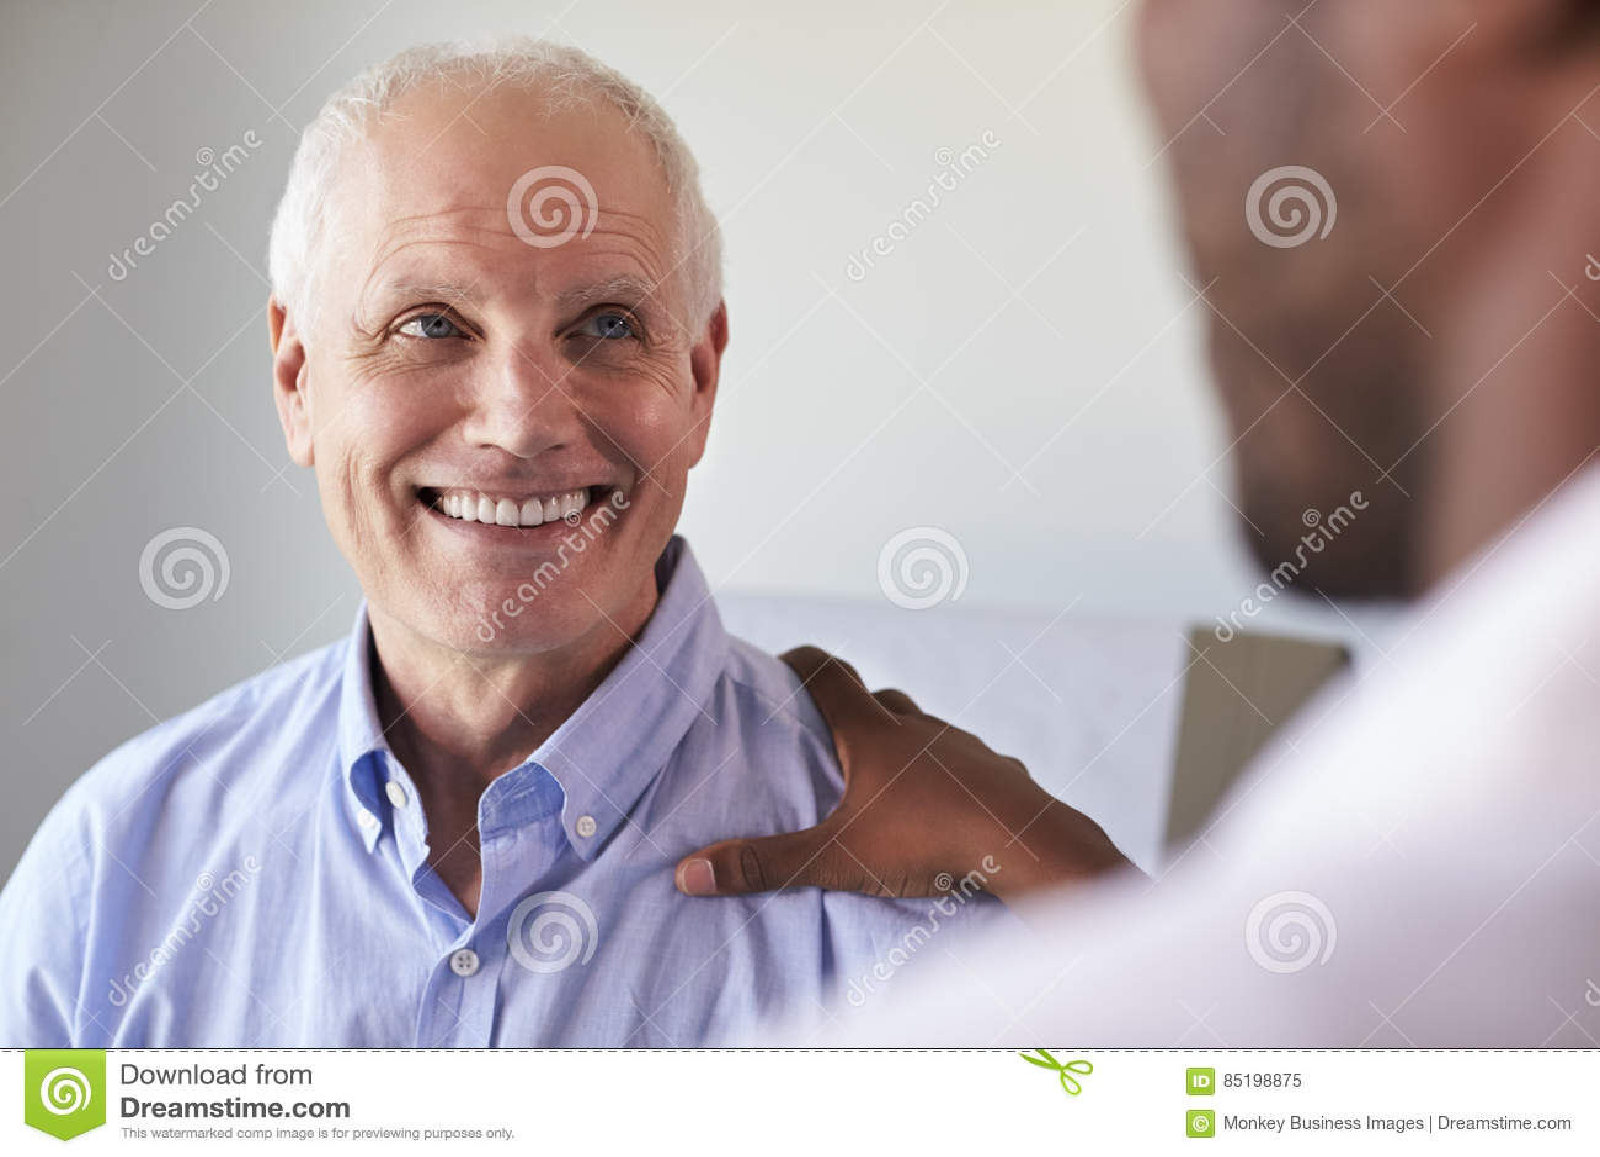 Meeting With Mature Male医生患者在检查屋子里